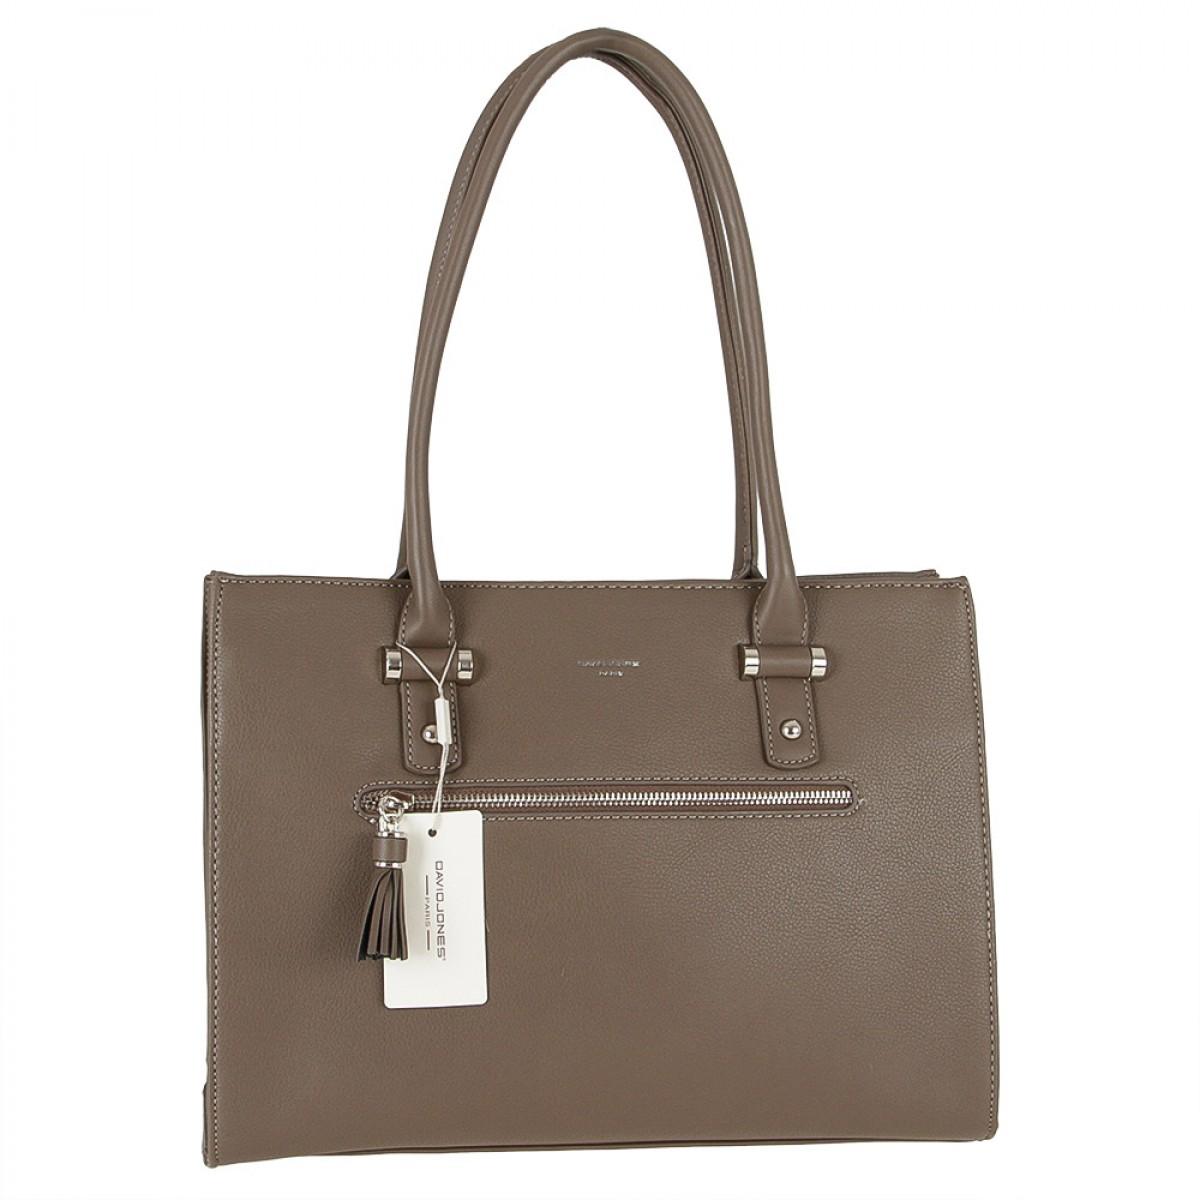 Жіноча сумка David Jones CM3930 D.TAUPE